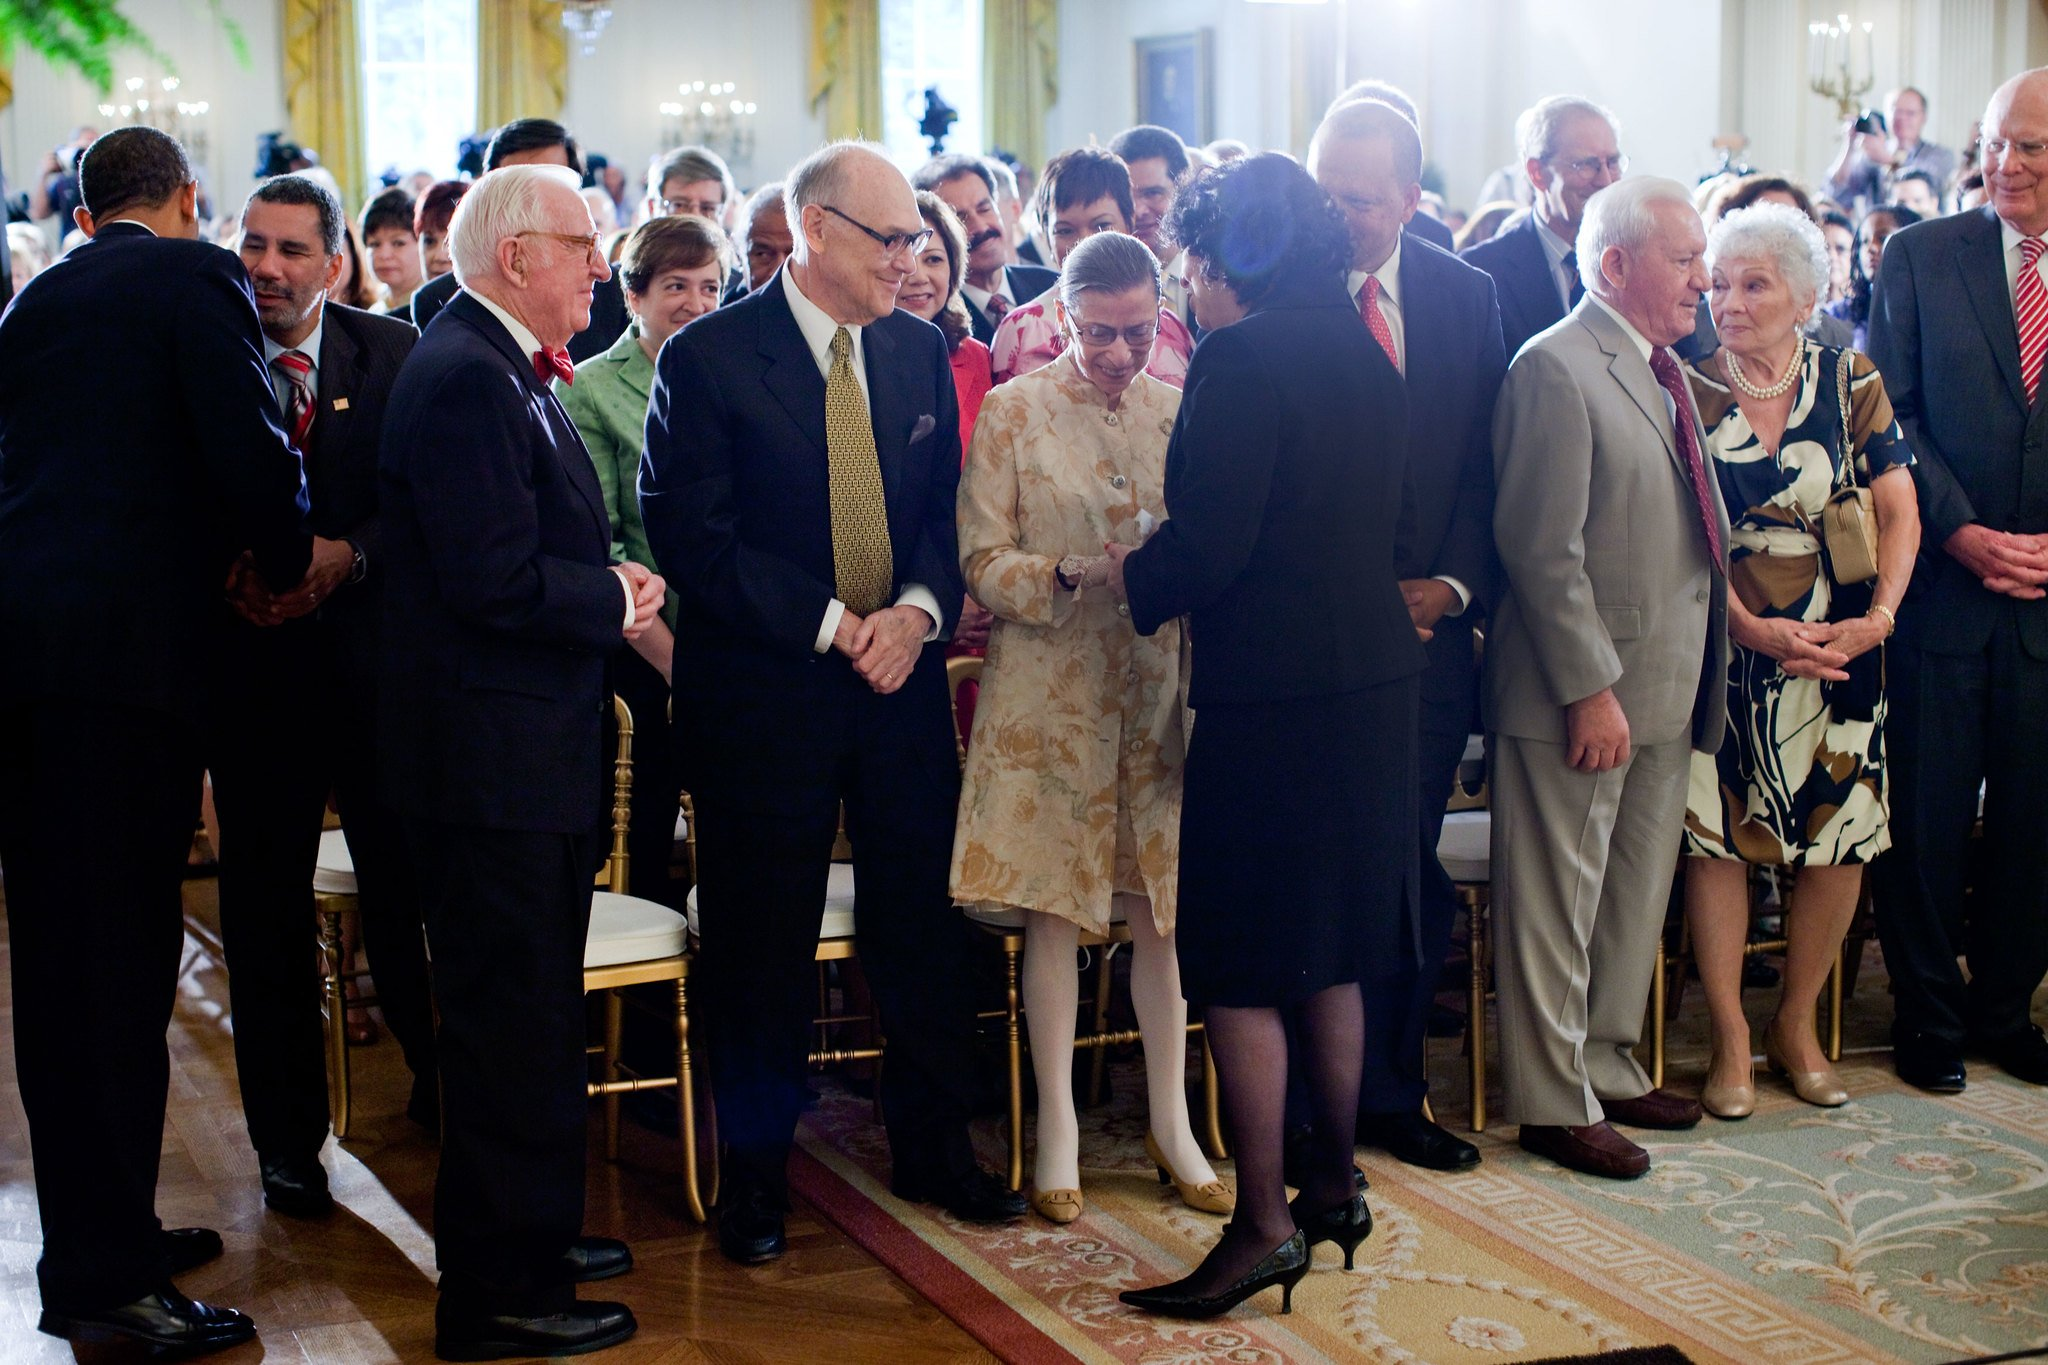 FITSNews – Death Of Ruth Bader Ginsburg Sets Up Supreme Court Showdown